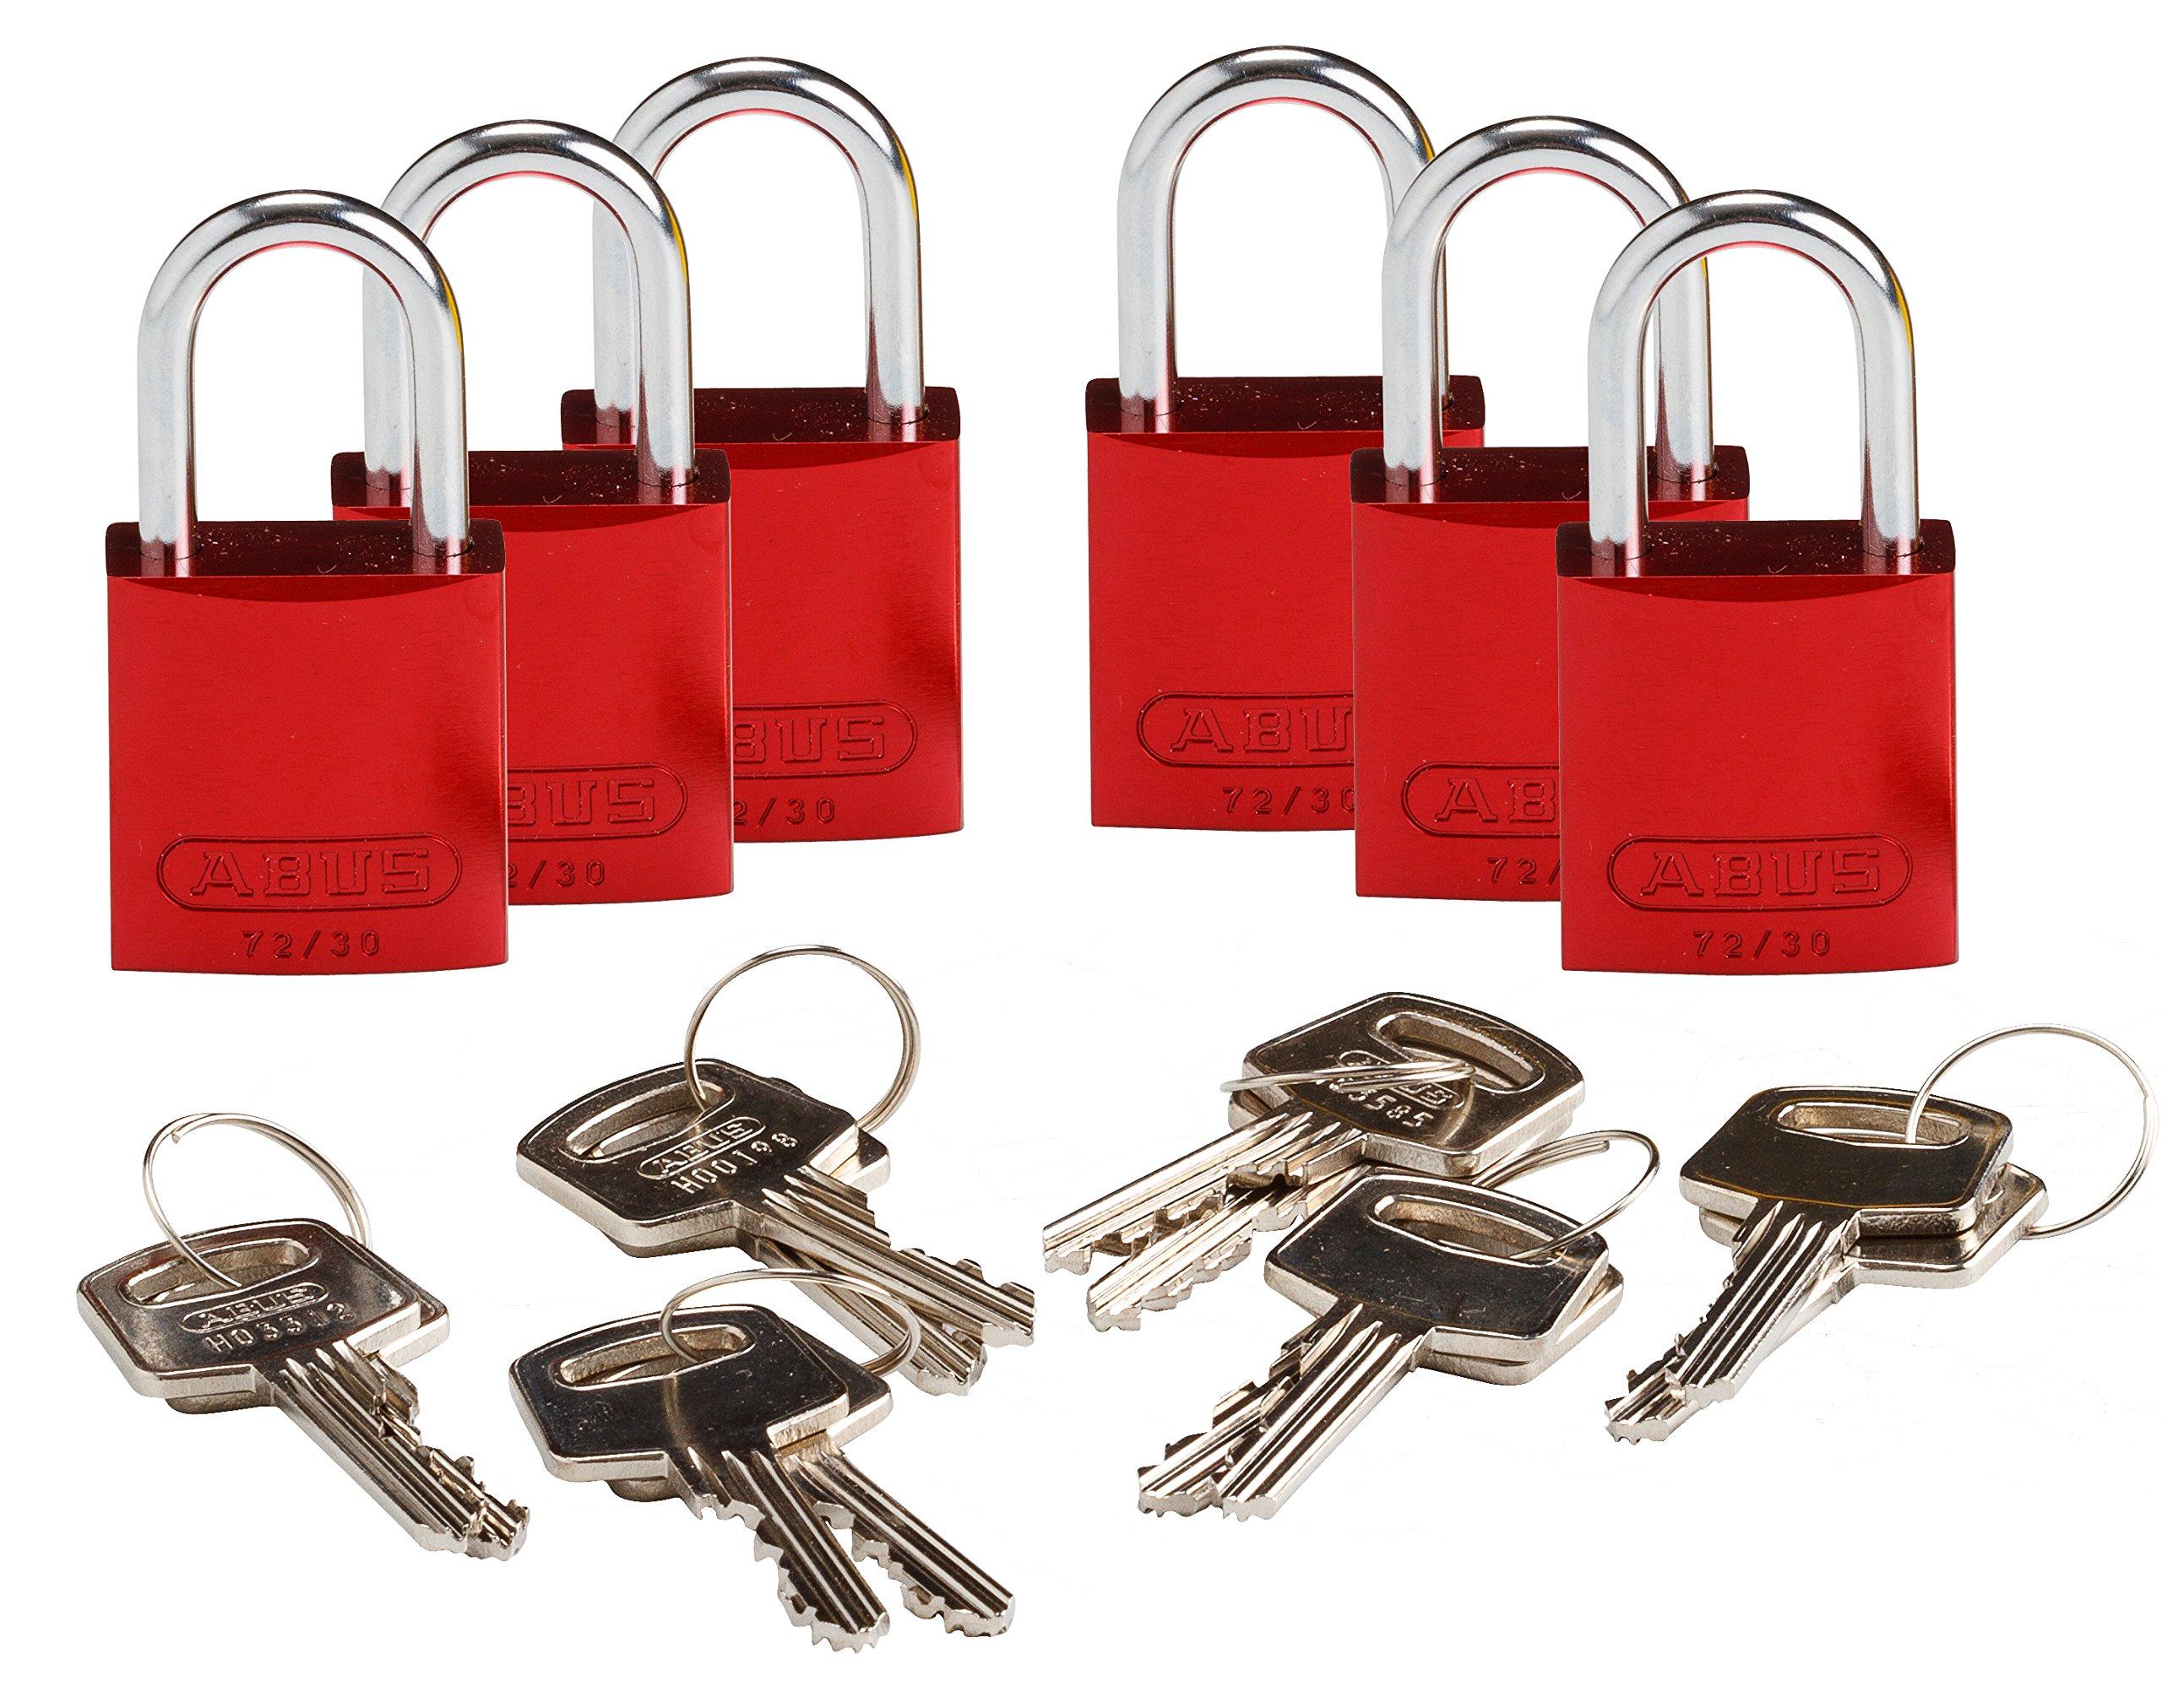 Brady 133288 Keyed Padlock, Alike Key, Aluminum (Pack of 6) by Brady